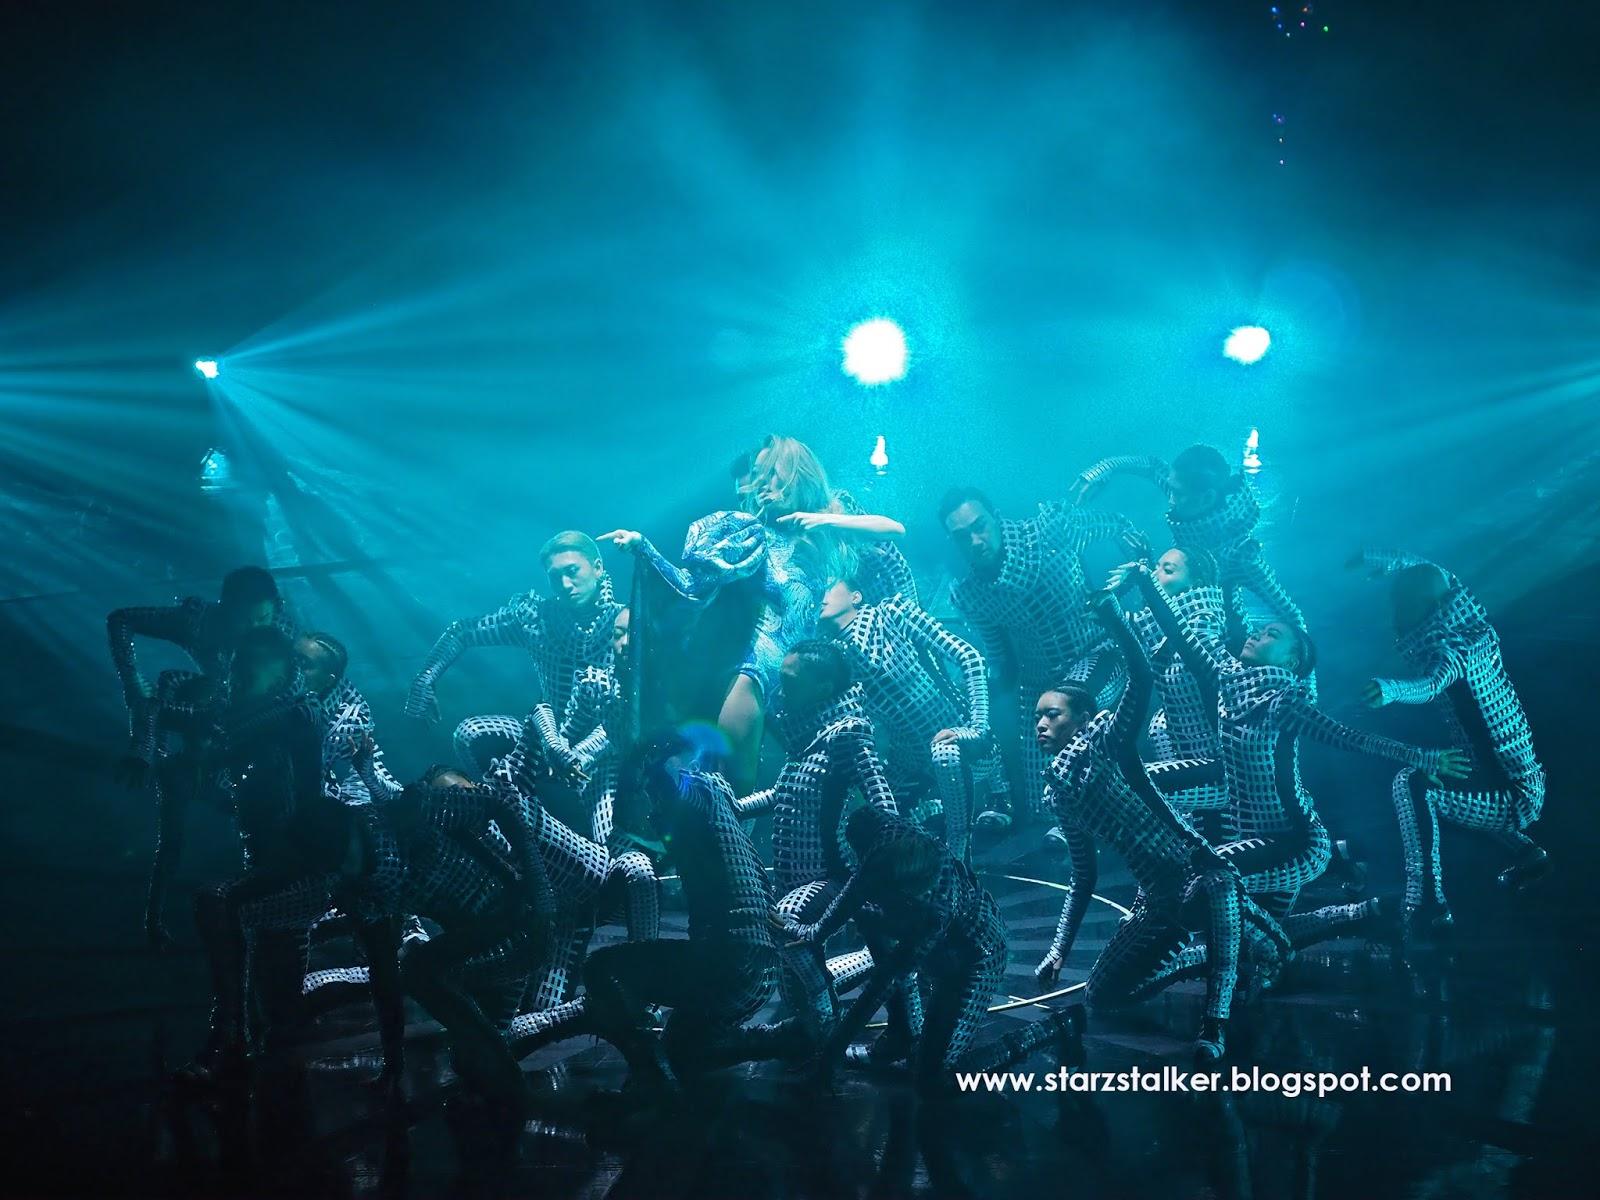 Starzstalker : PRETTY CRAZY JOEY YUNG CONCERT TOUR 容祖兒 Pretty Crazy 演唱會 - 5th - 18th / 20th - 24th August 2019 at Hong Kong Coliseum ...